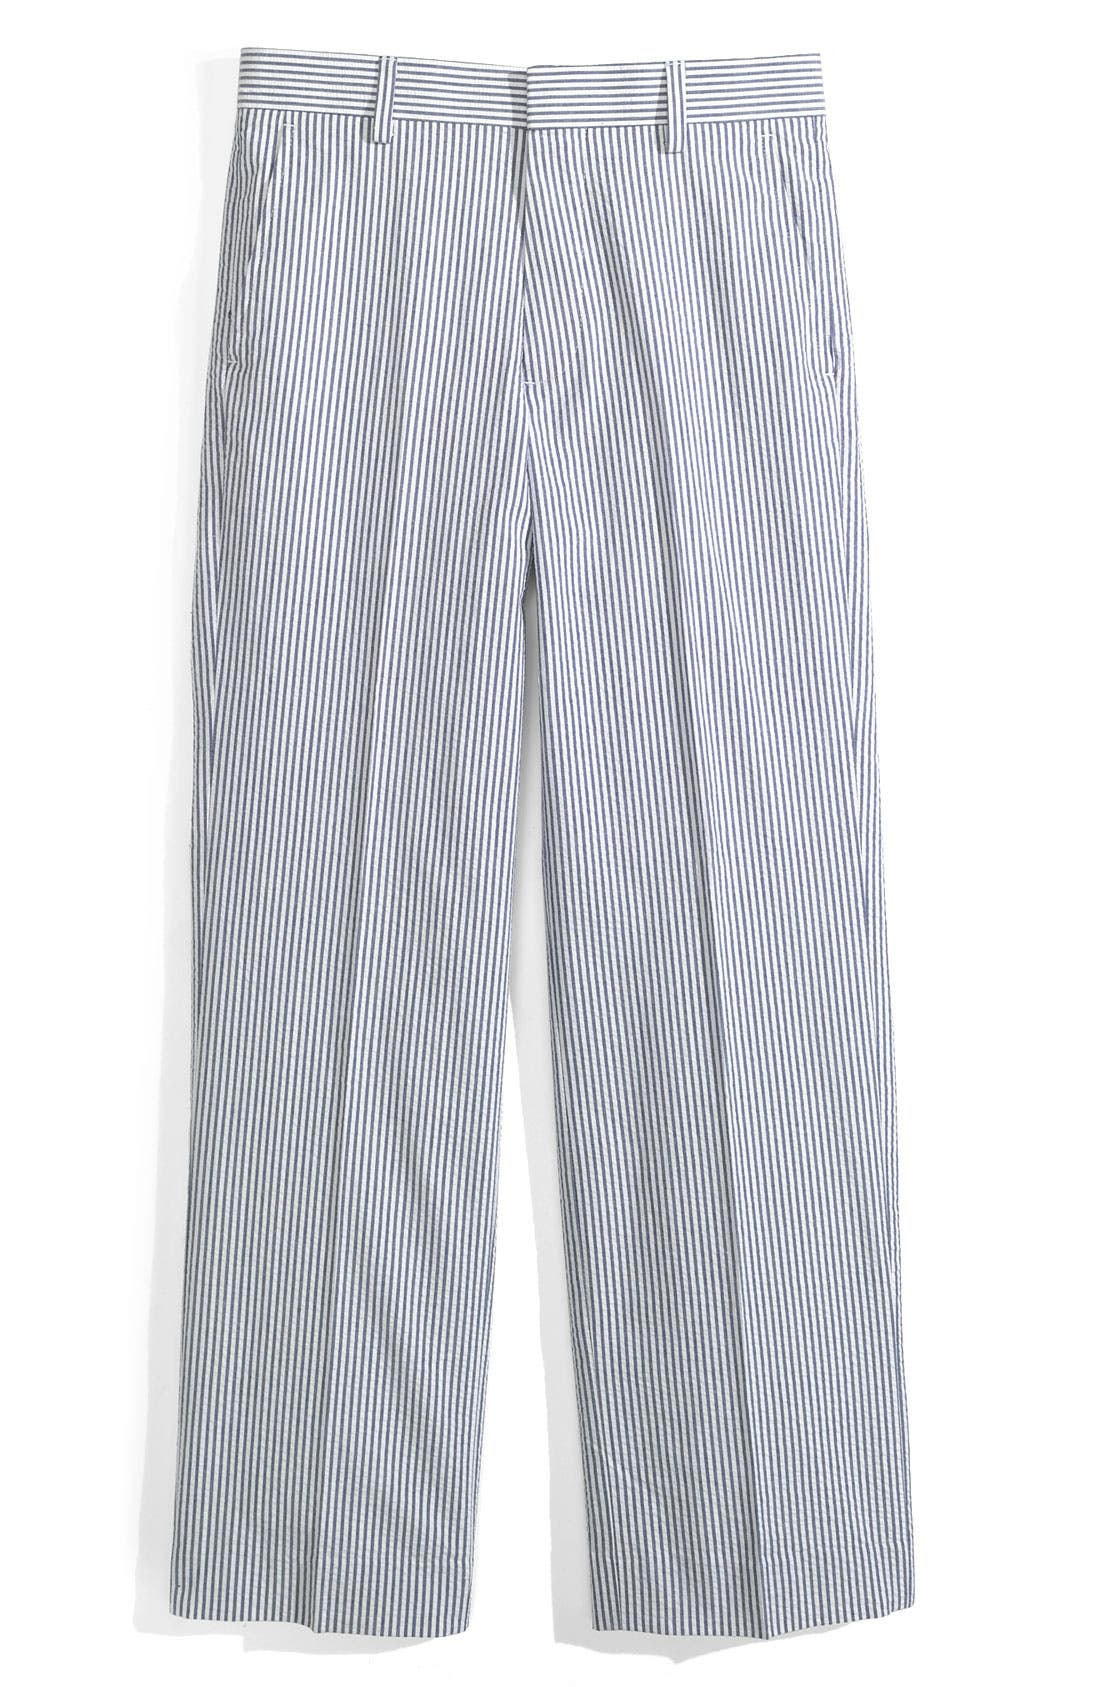 Seersucker Pants,                         Main,                         color, Blue Stripe